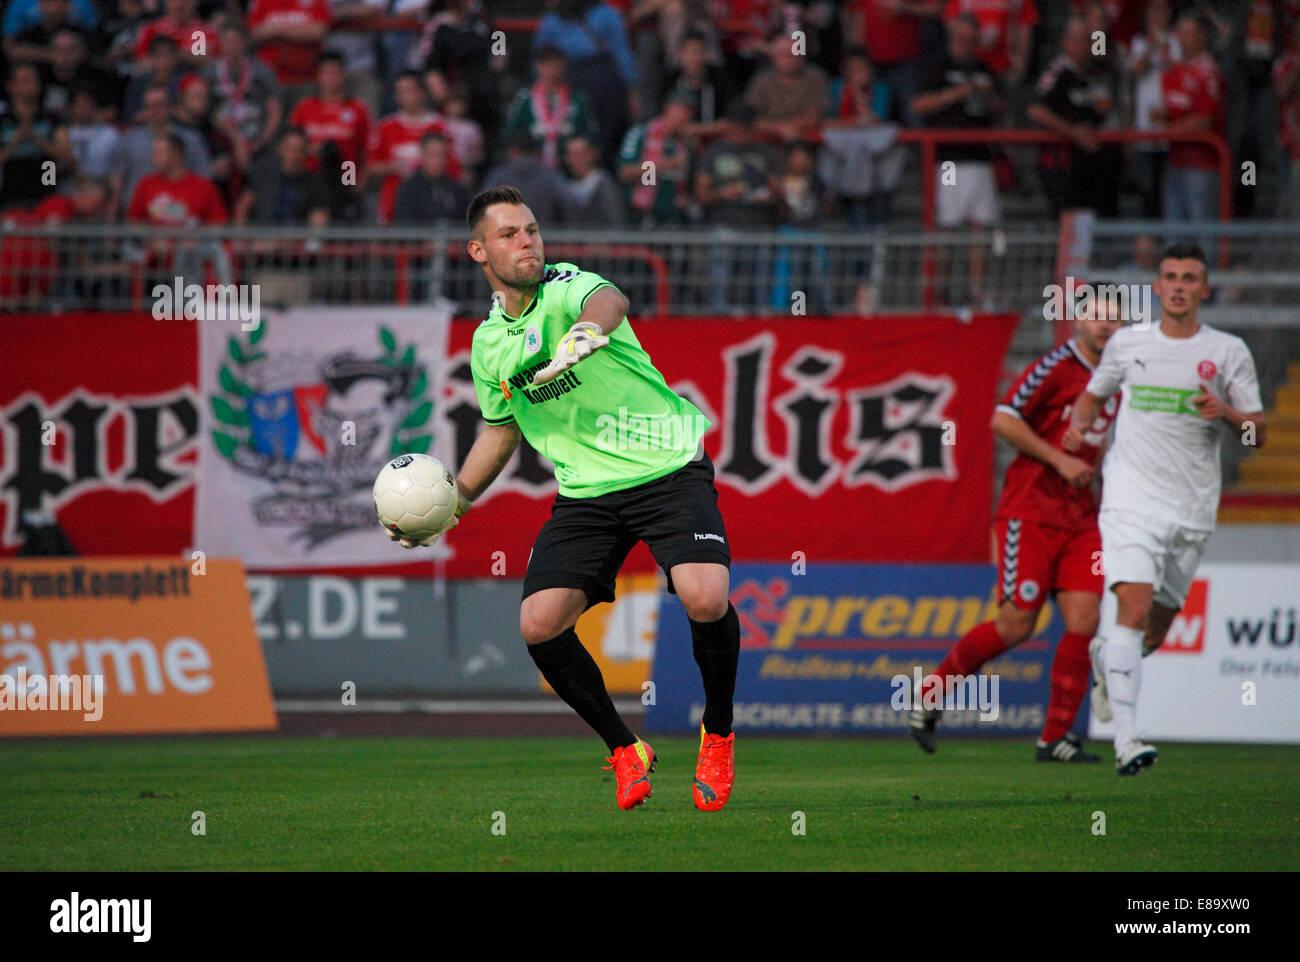 sports, football, Regional League West, 2014/2015, Rot Weiss Oberhausen versus Fortuna Duesseldorf U23 3:1, Stadium - Stock Image